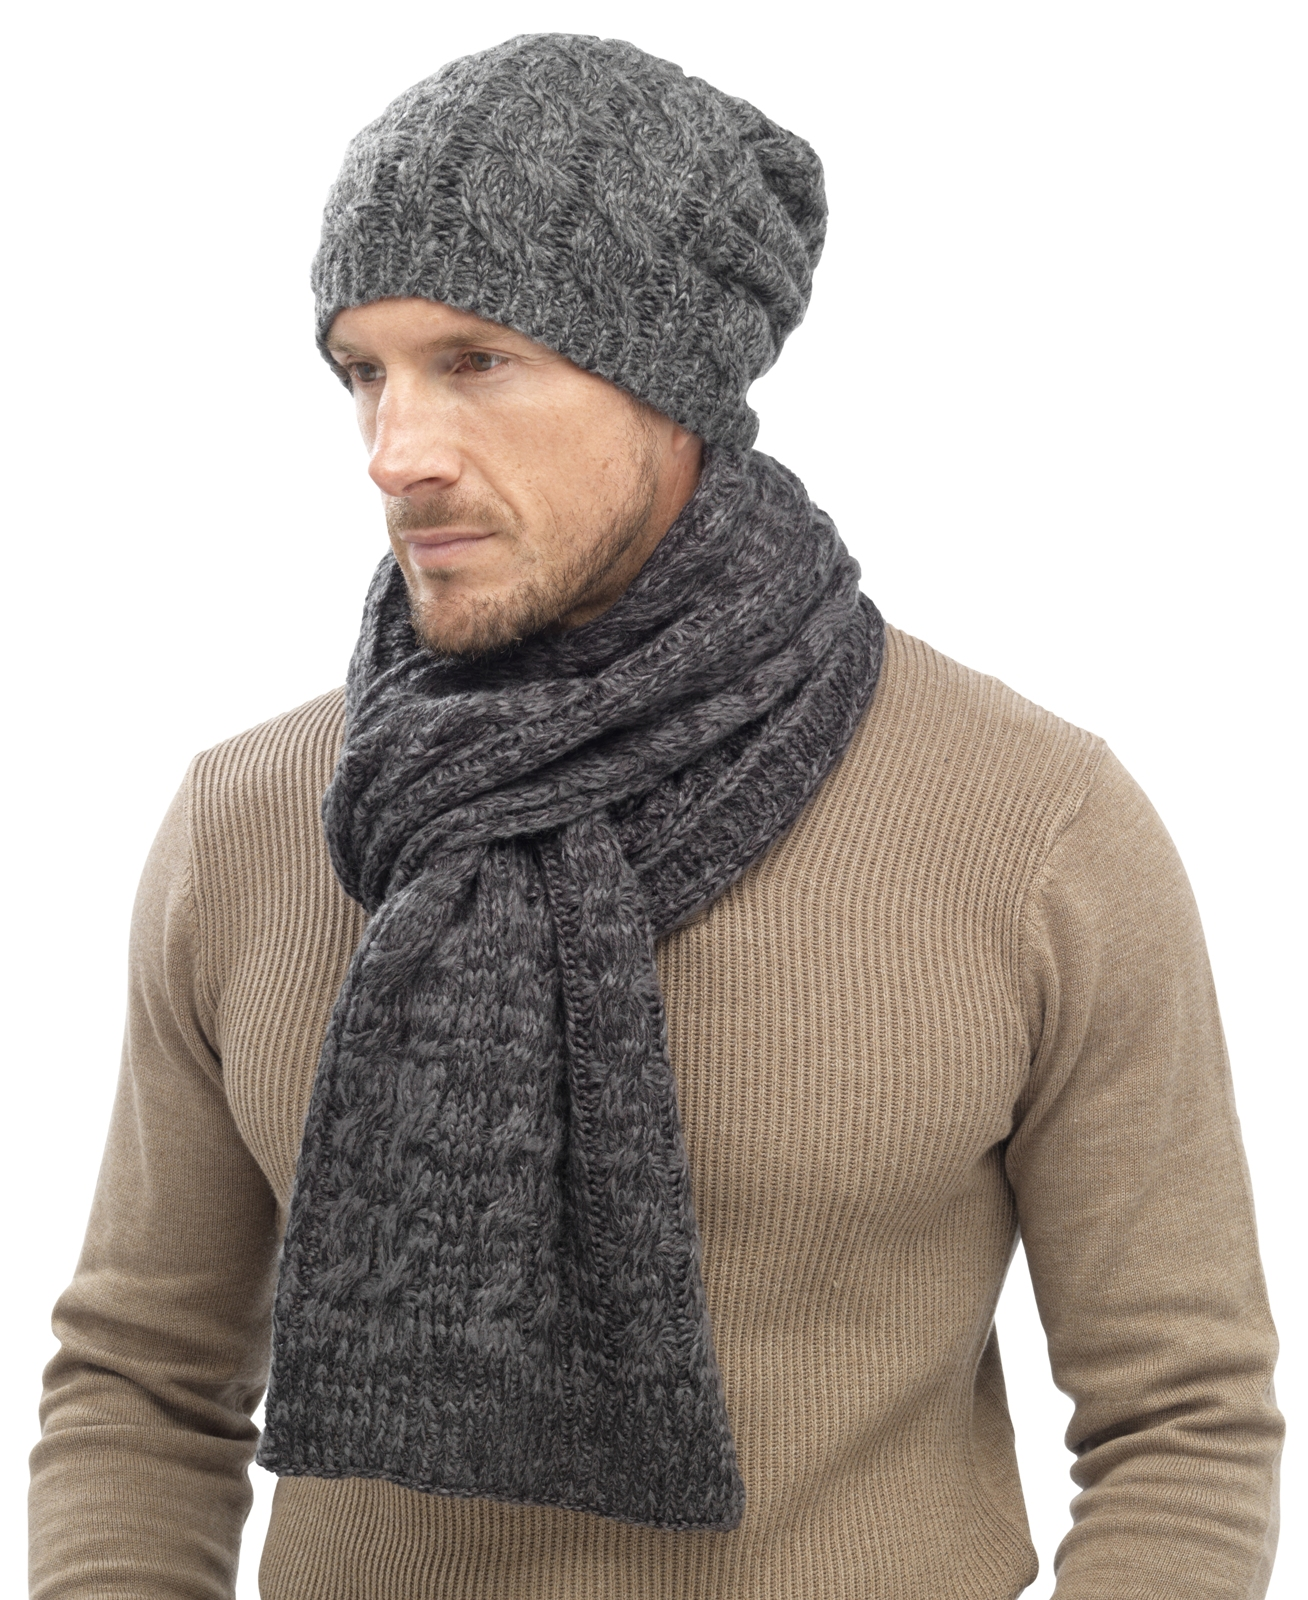 Knitting Pattern Mens Bobble Hat : Mens Luxury Fairisle Cable Knit Slouch Beanie Bobble Hat ...